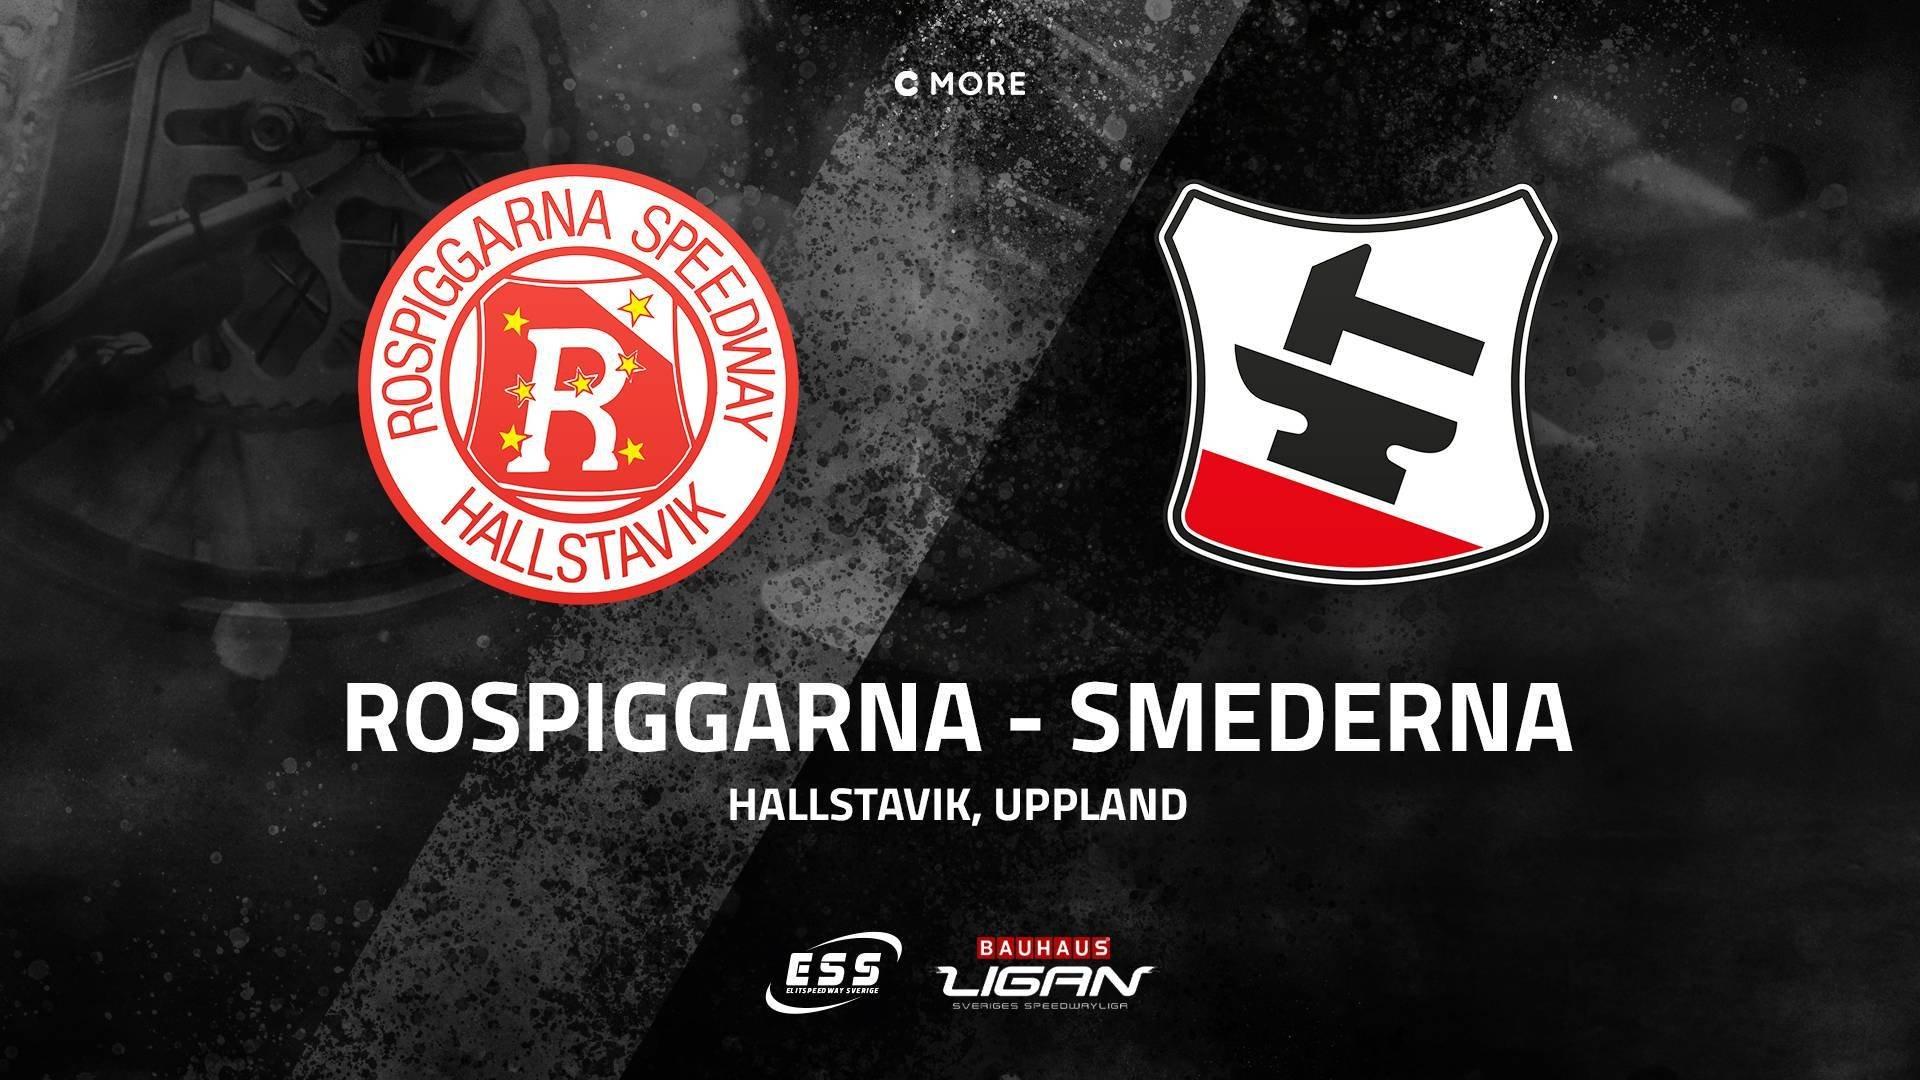 Rospiggarna - Eskilstuna Smederna